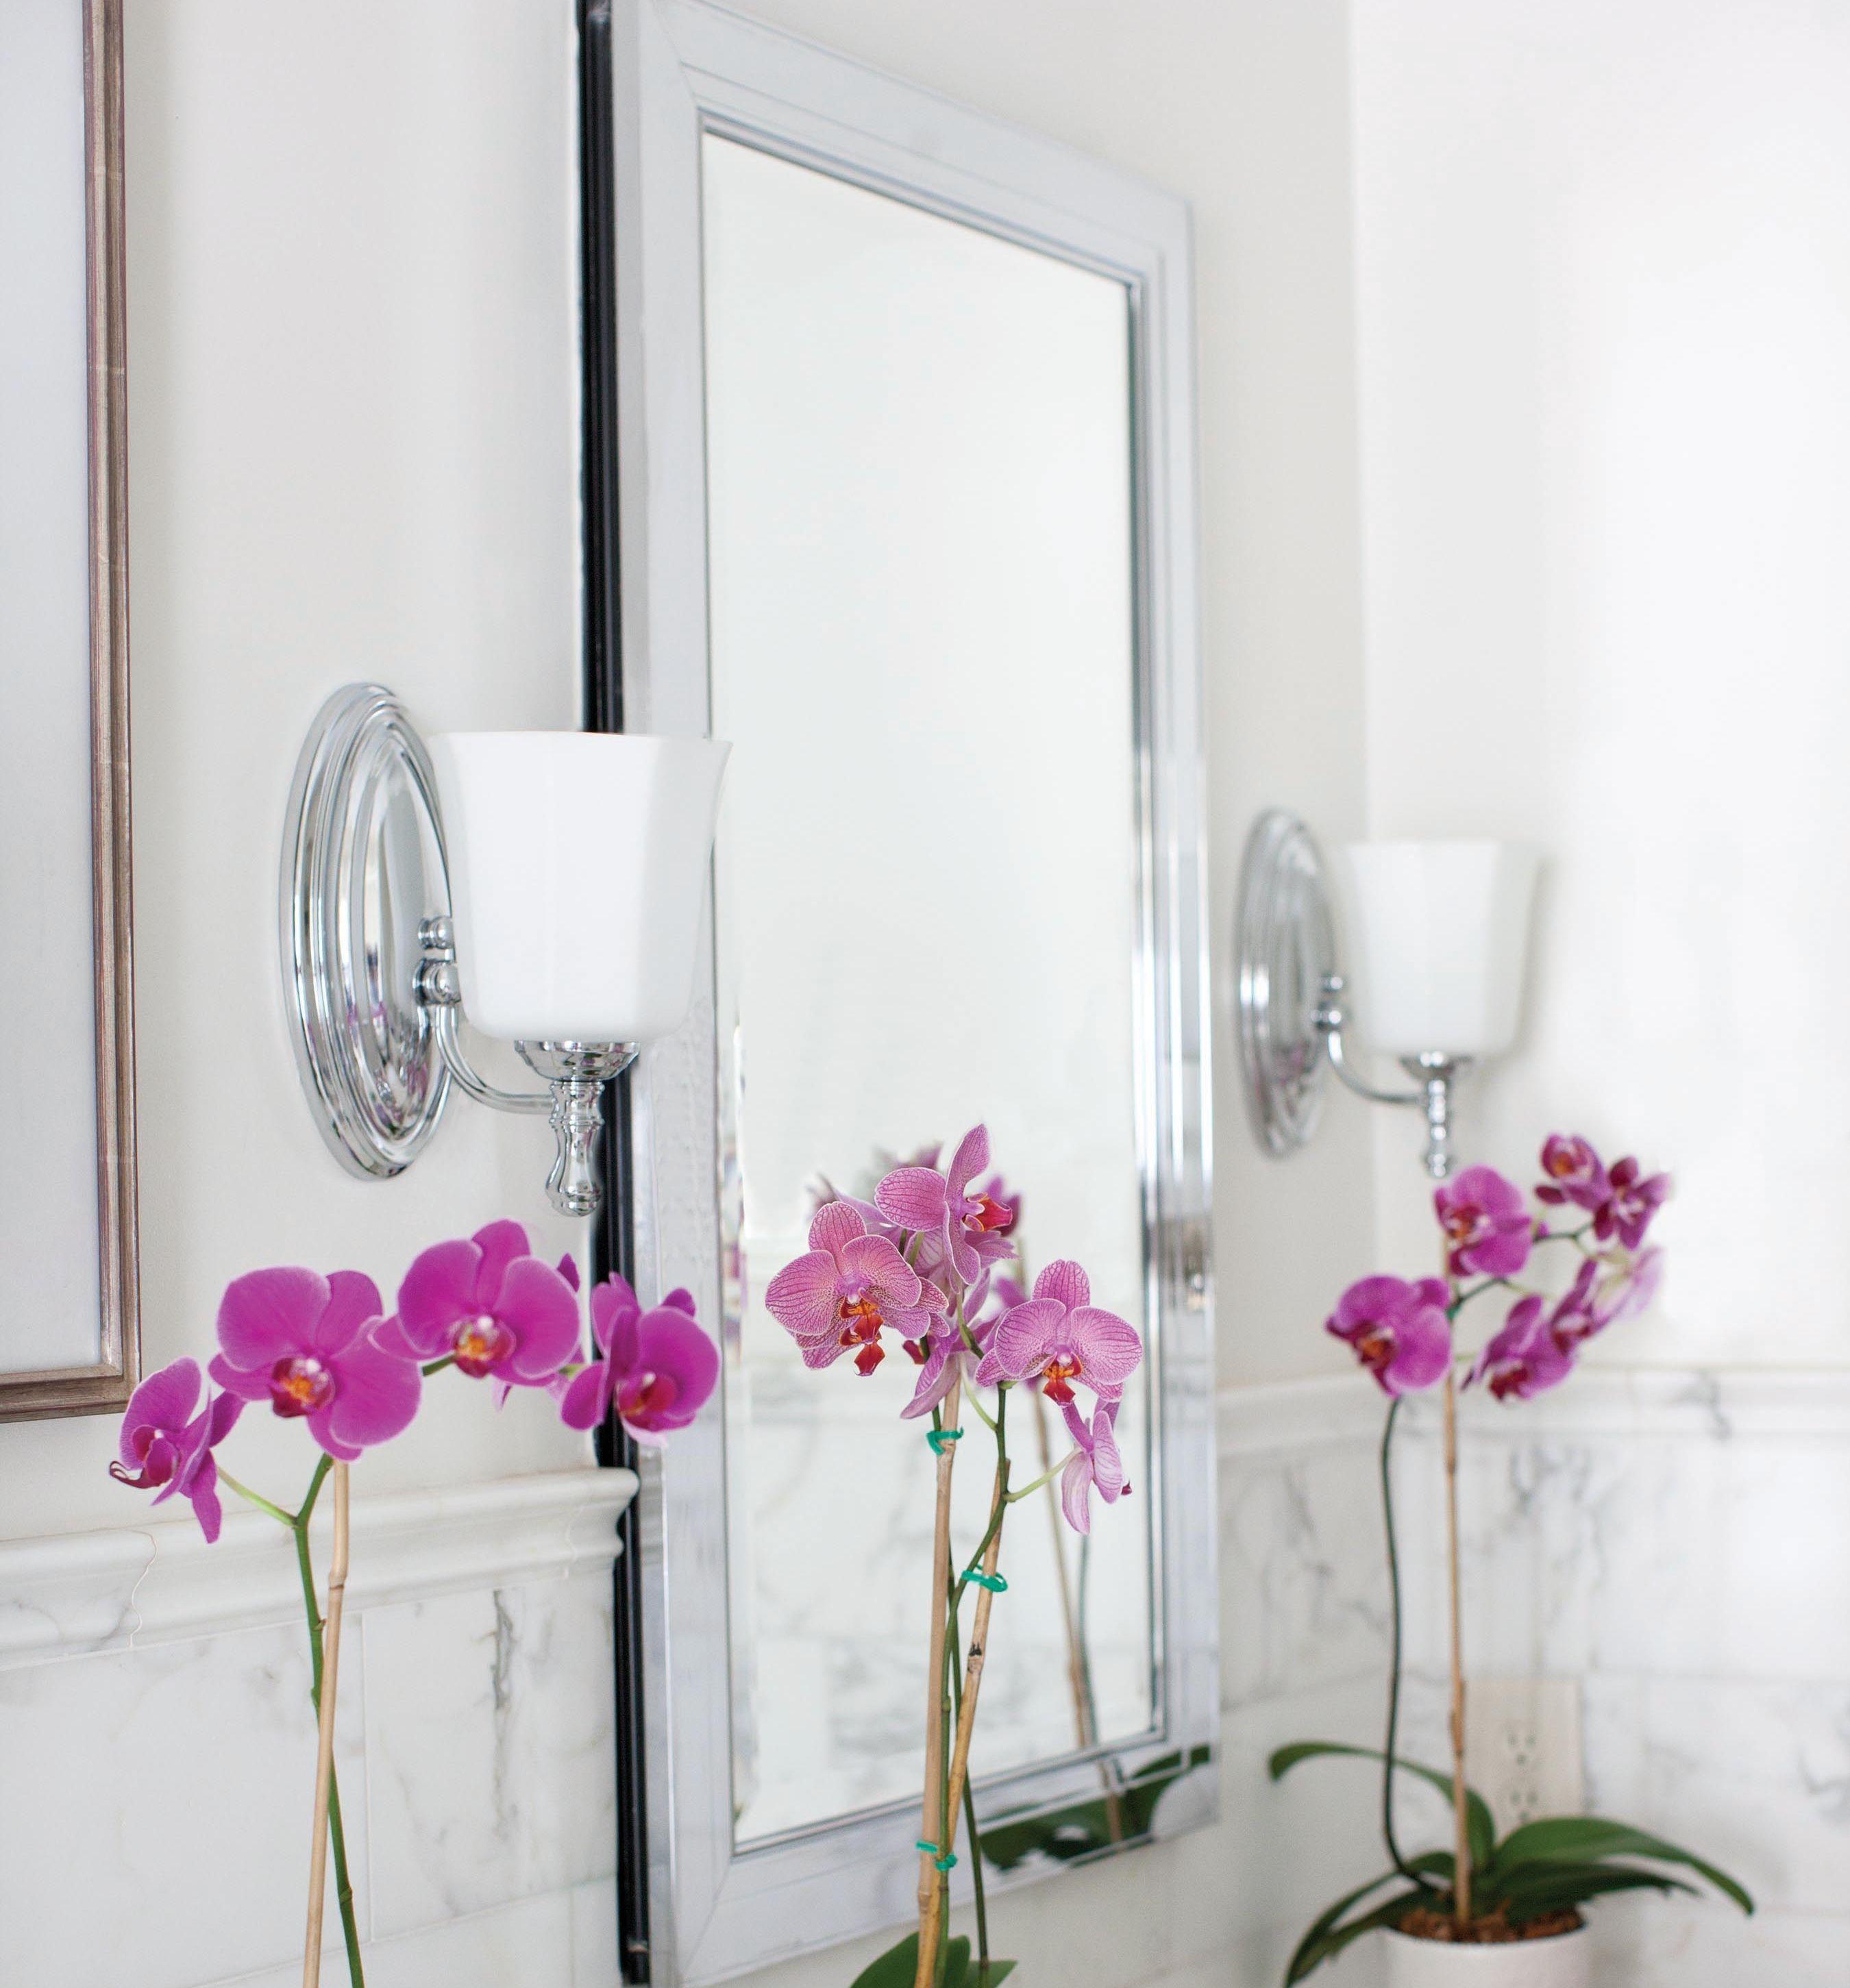 Hinkley Shelly Bath Sconce Lights In Chrome Lightsonline Com Bathlighting Bathlights Vanitylights Vanity Bathroom Lighting Hinkley Bathroom Wall Sconces